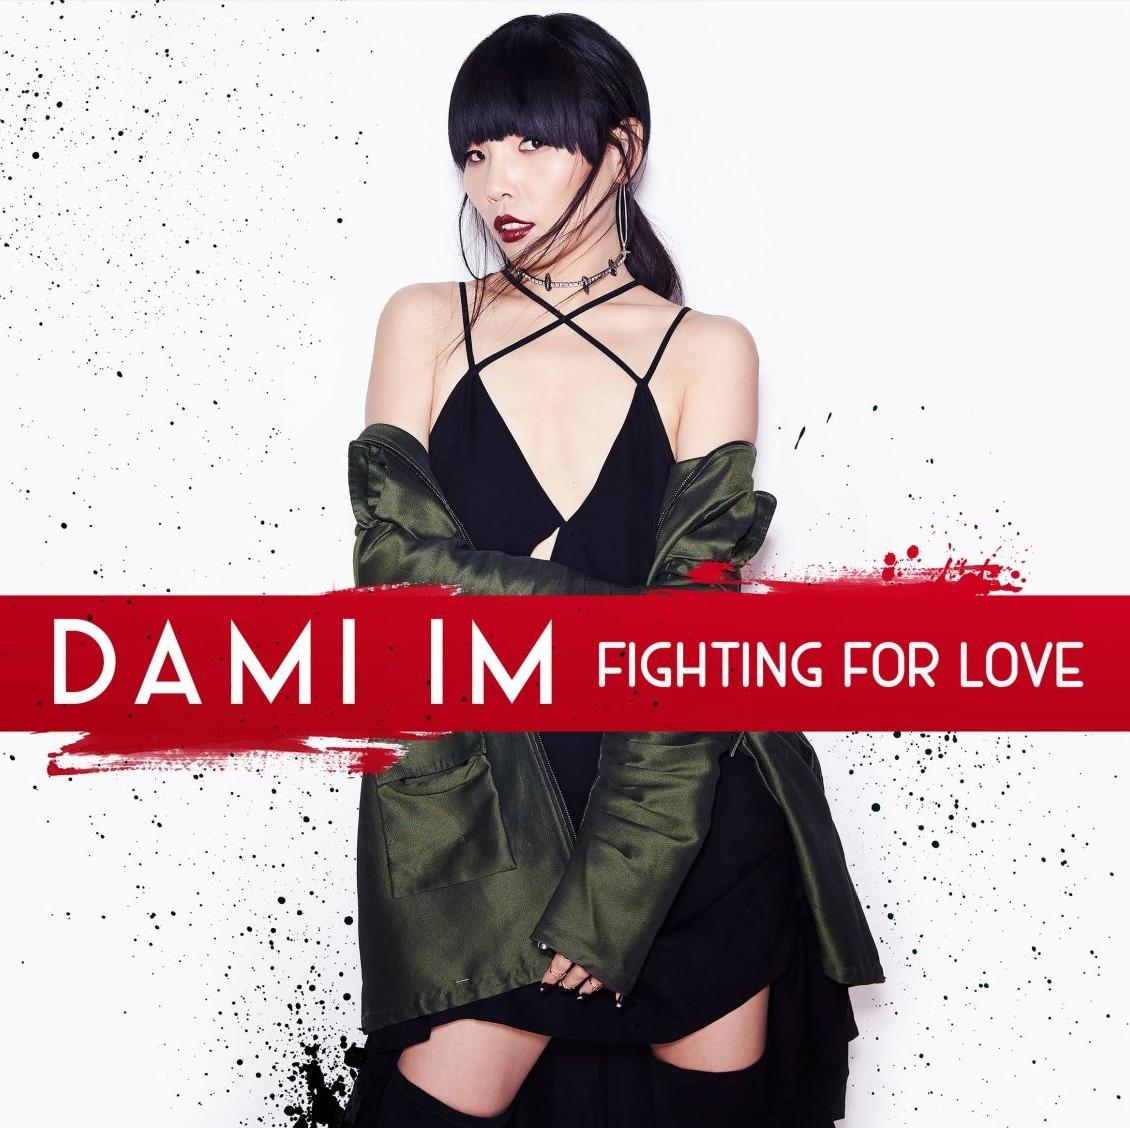 dami-im-fighting-for-love-2016-2480x2480_edited